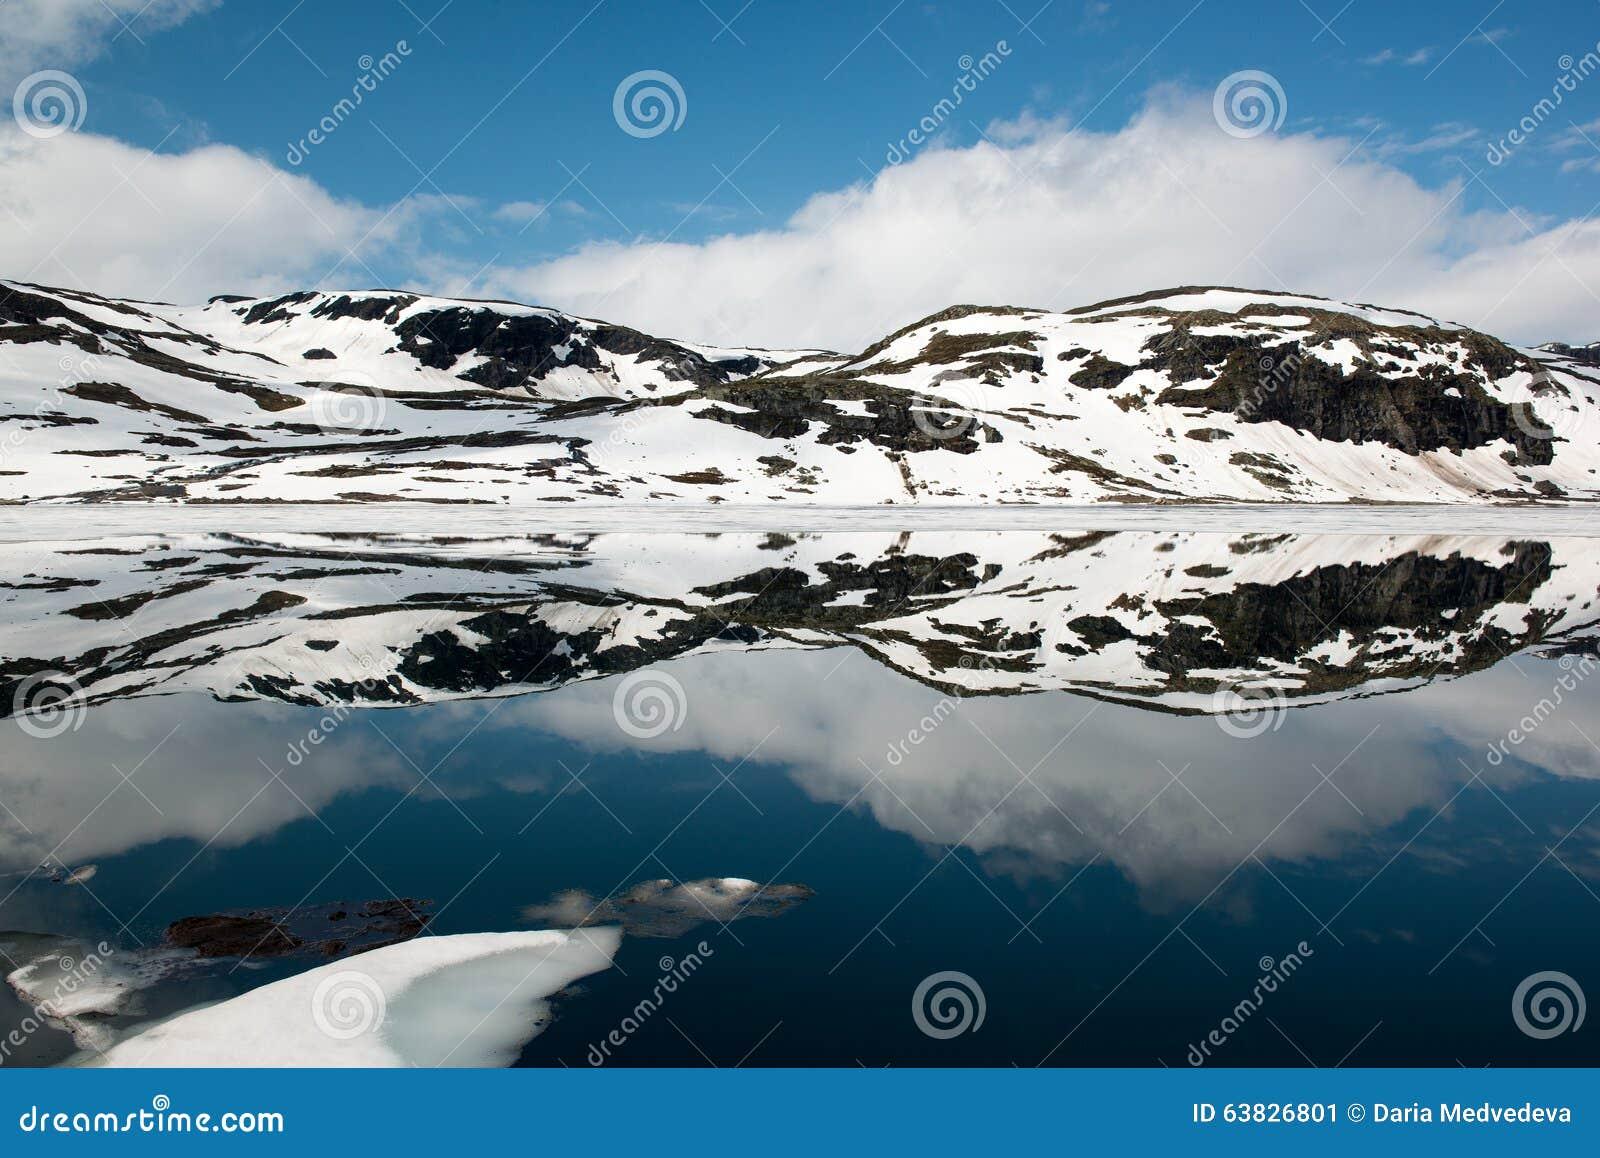 sky blue mountain reflection - photo #15